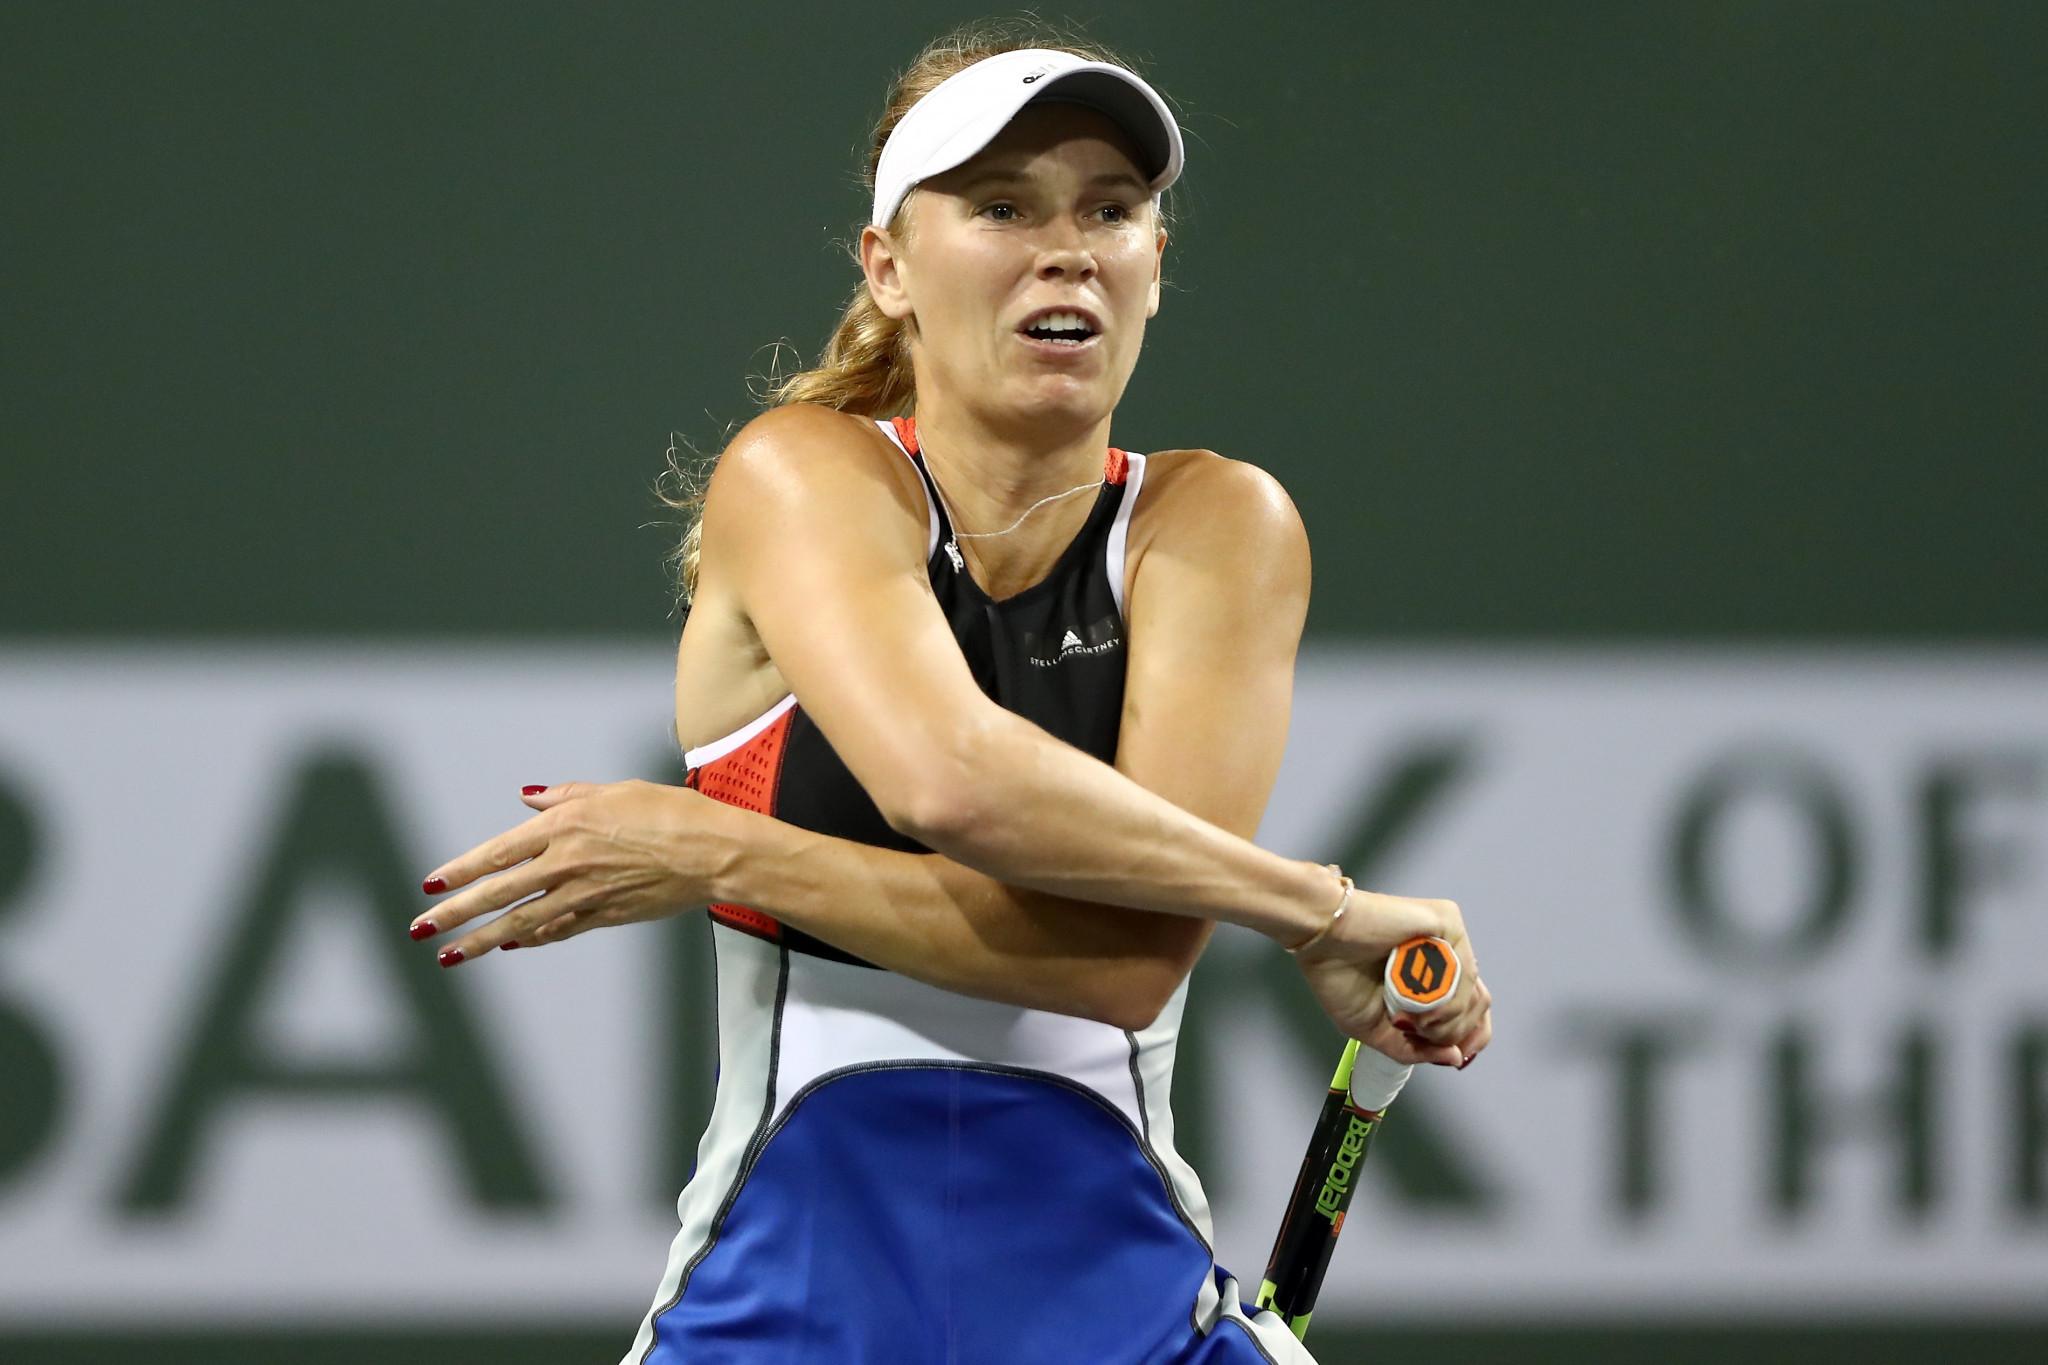 Kasatkina beats Wozniacki to reach quarter-finals at Indian Wells Masters